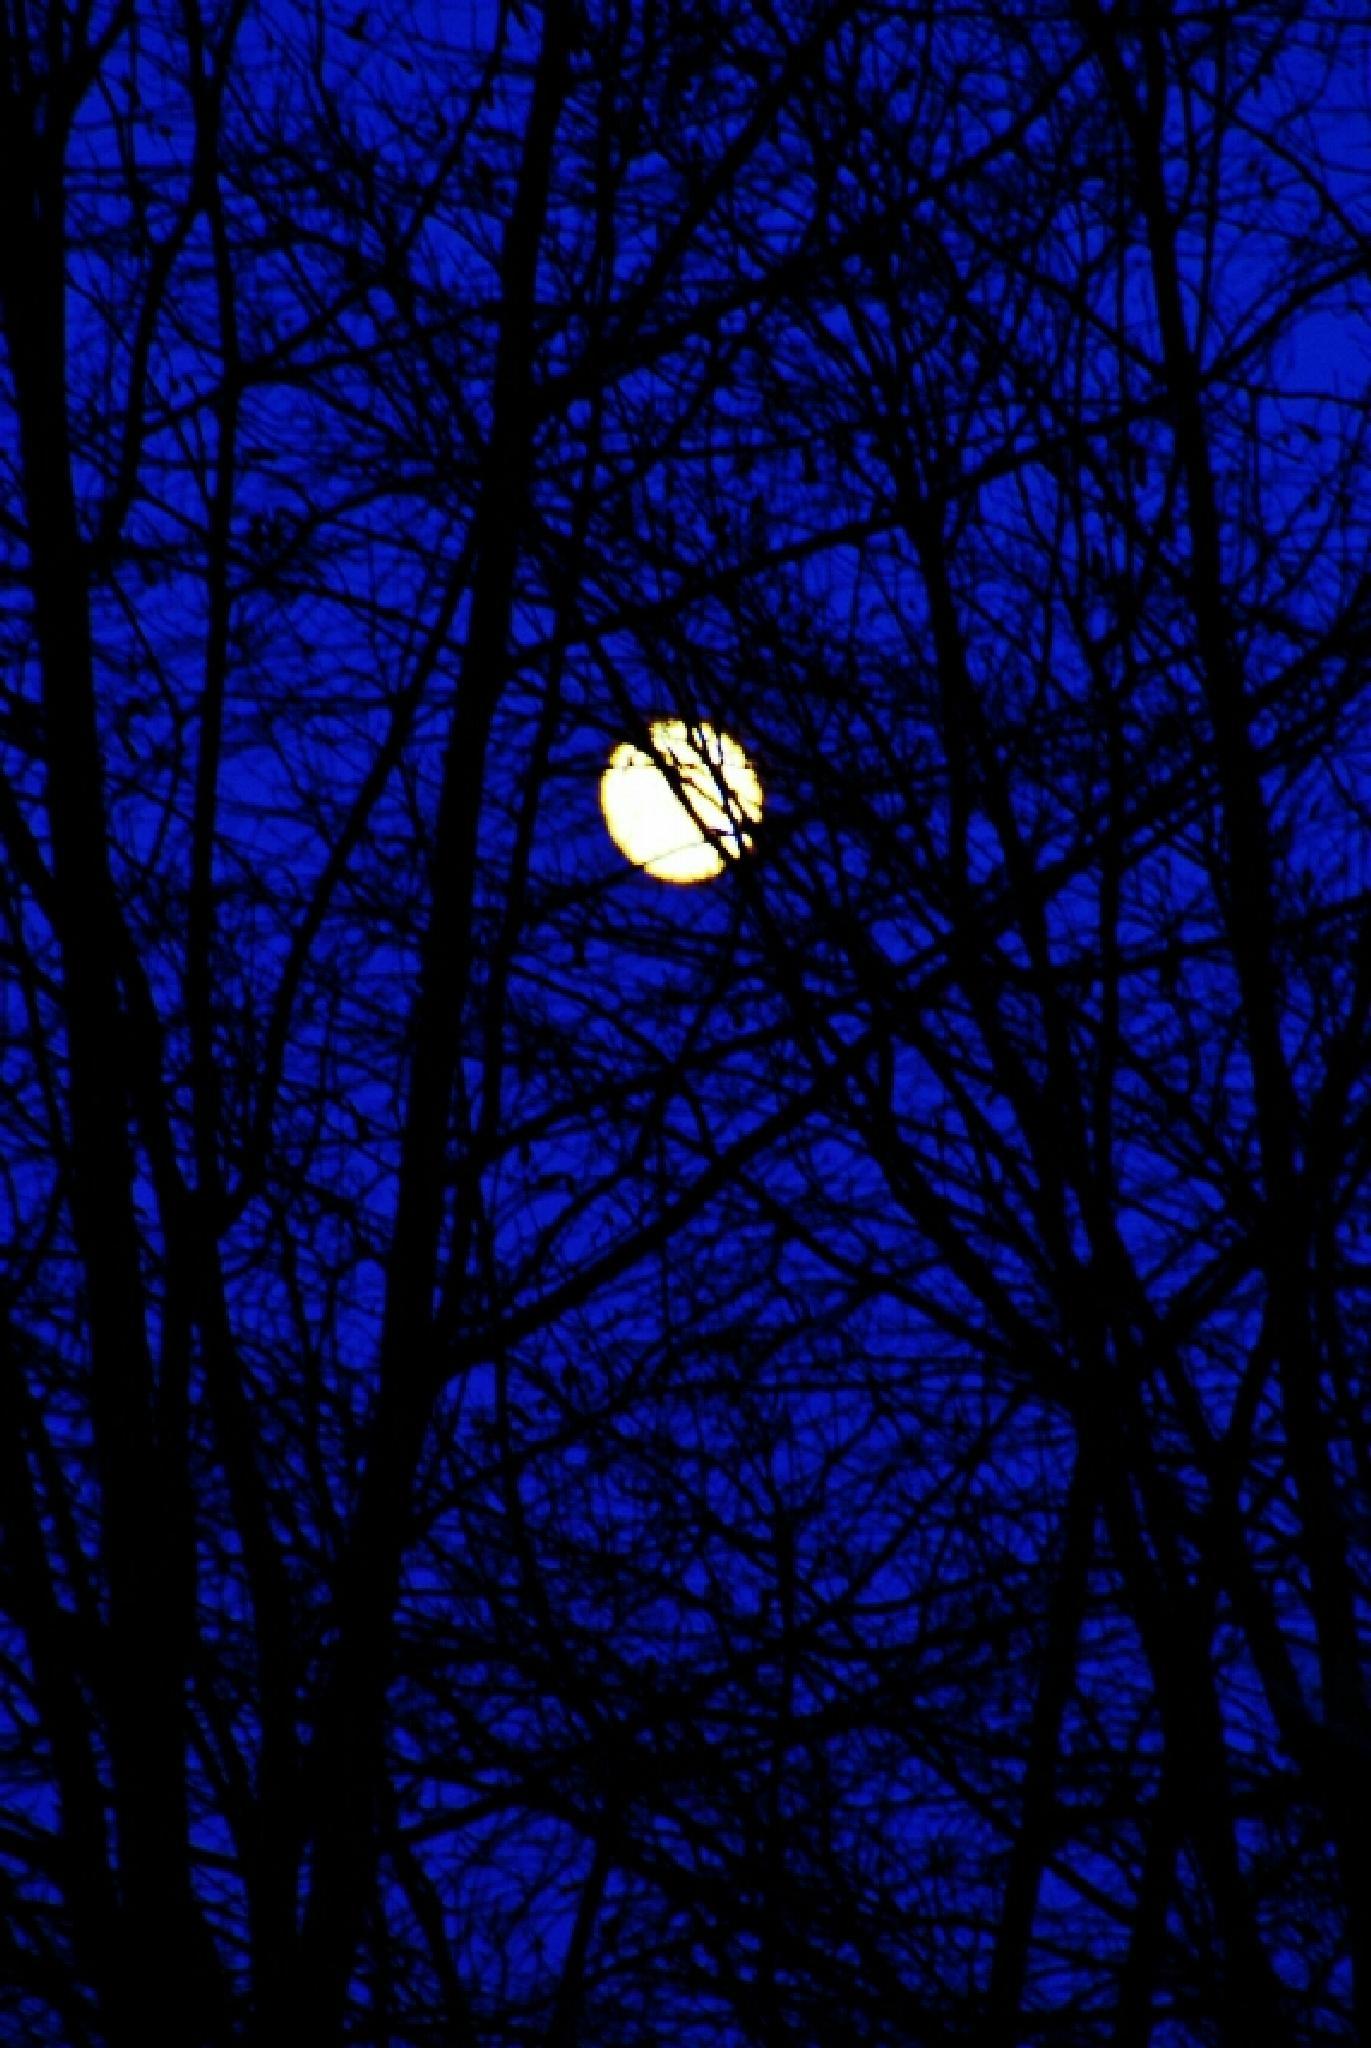 Moon Glow by goldenoo7